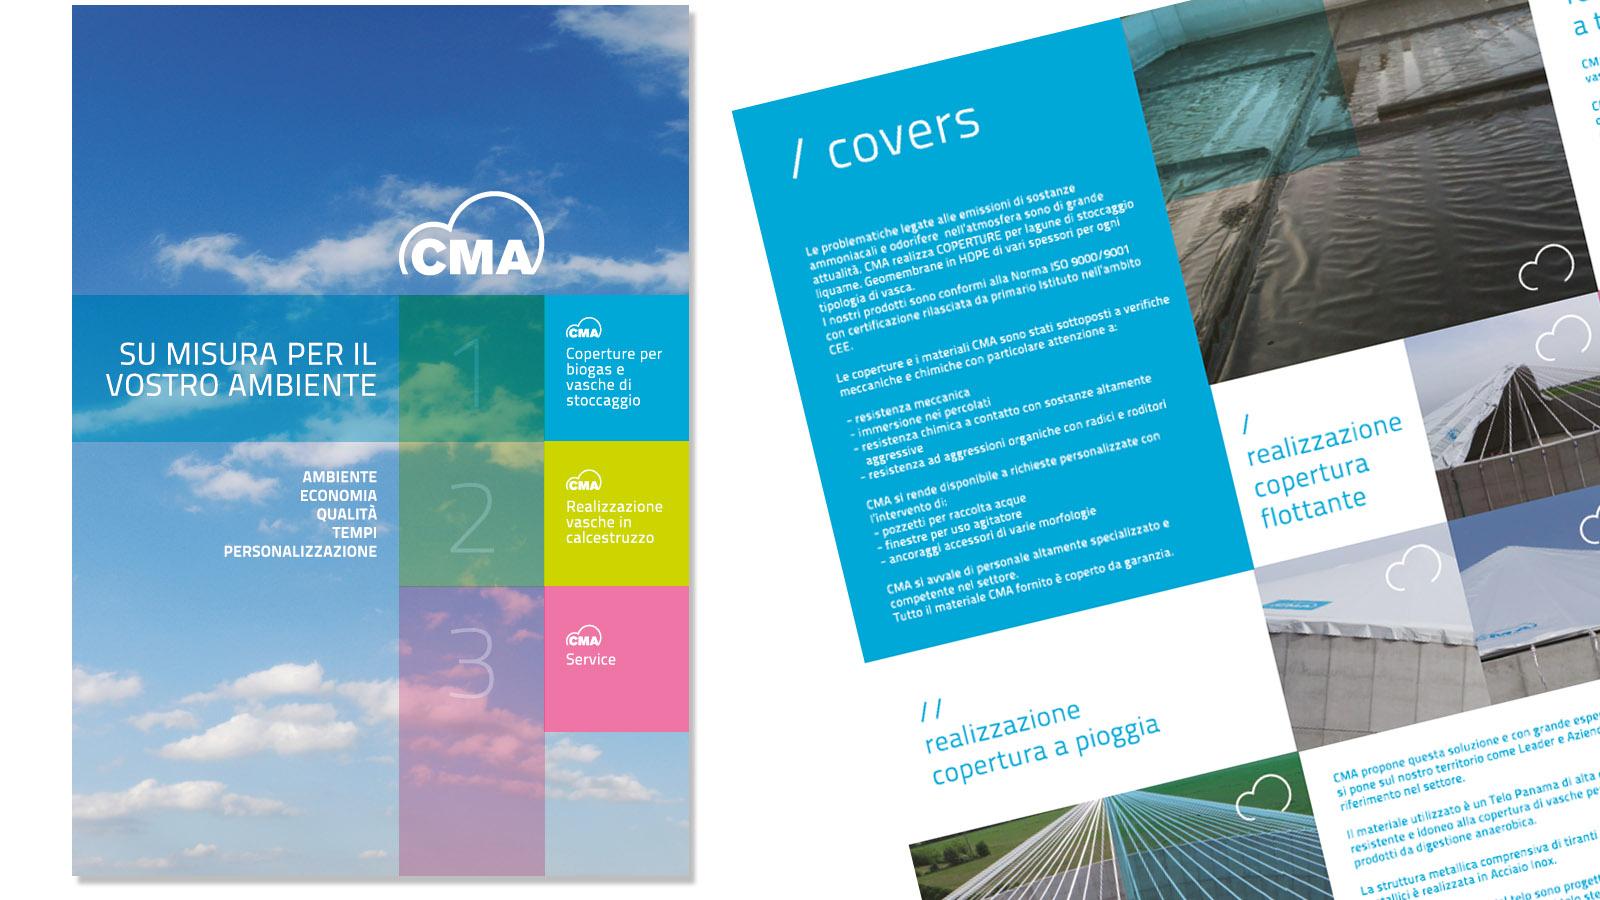 cma-covers